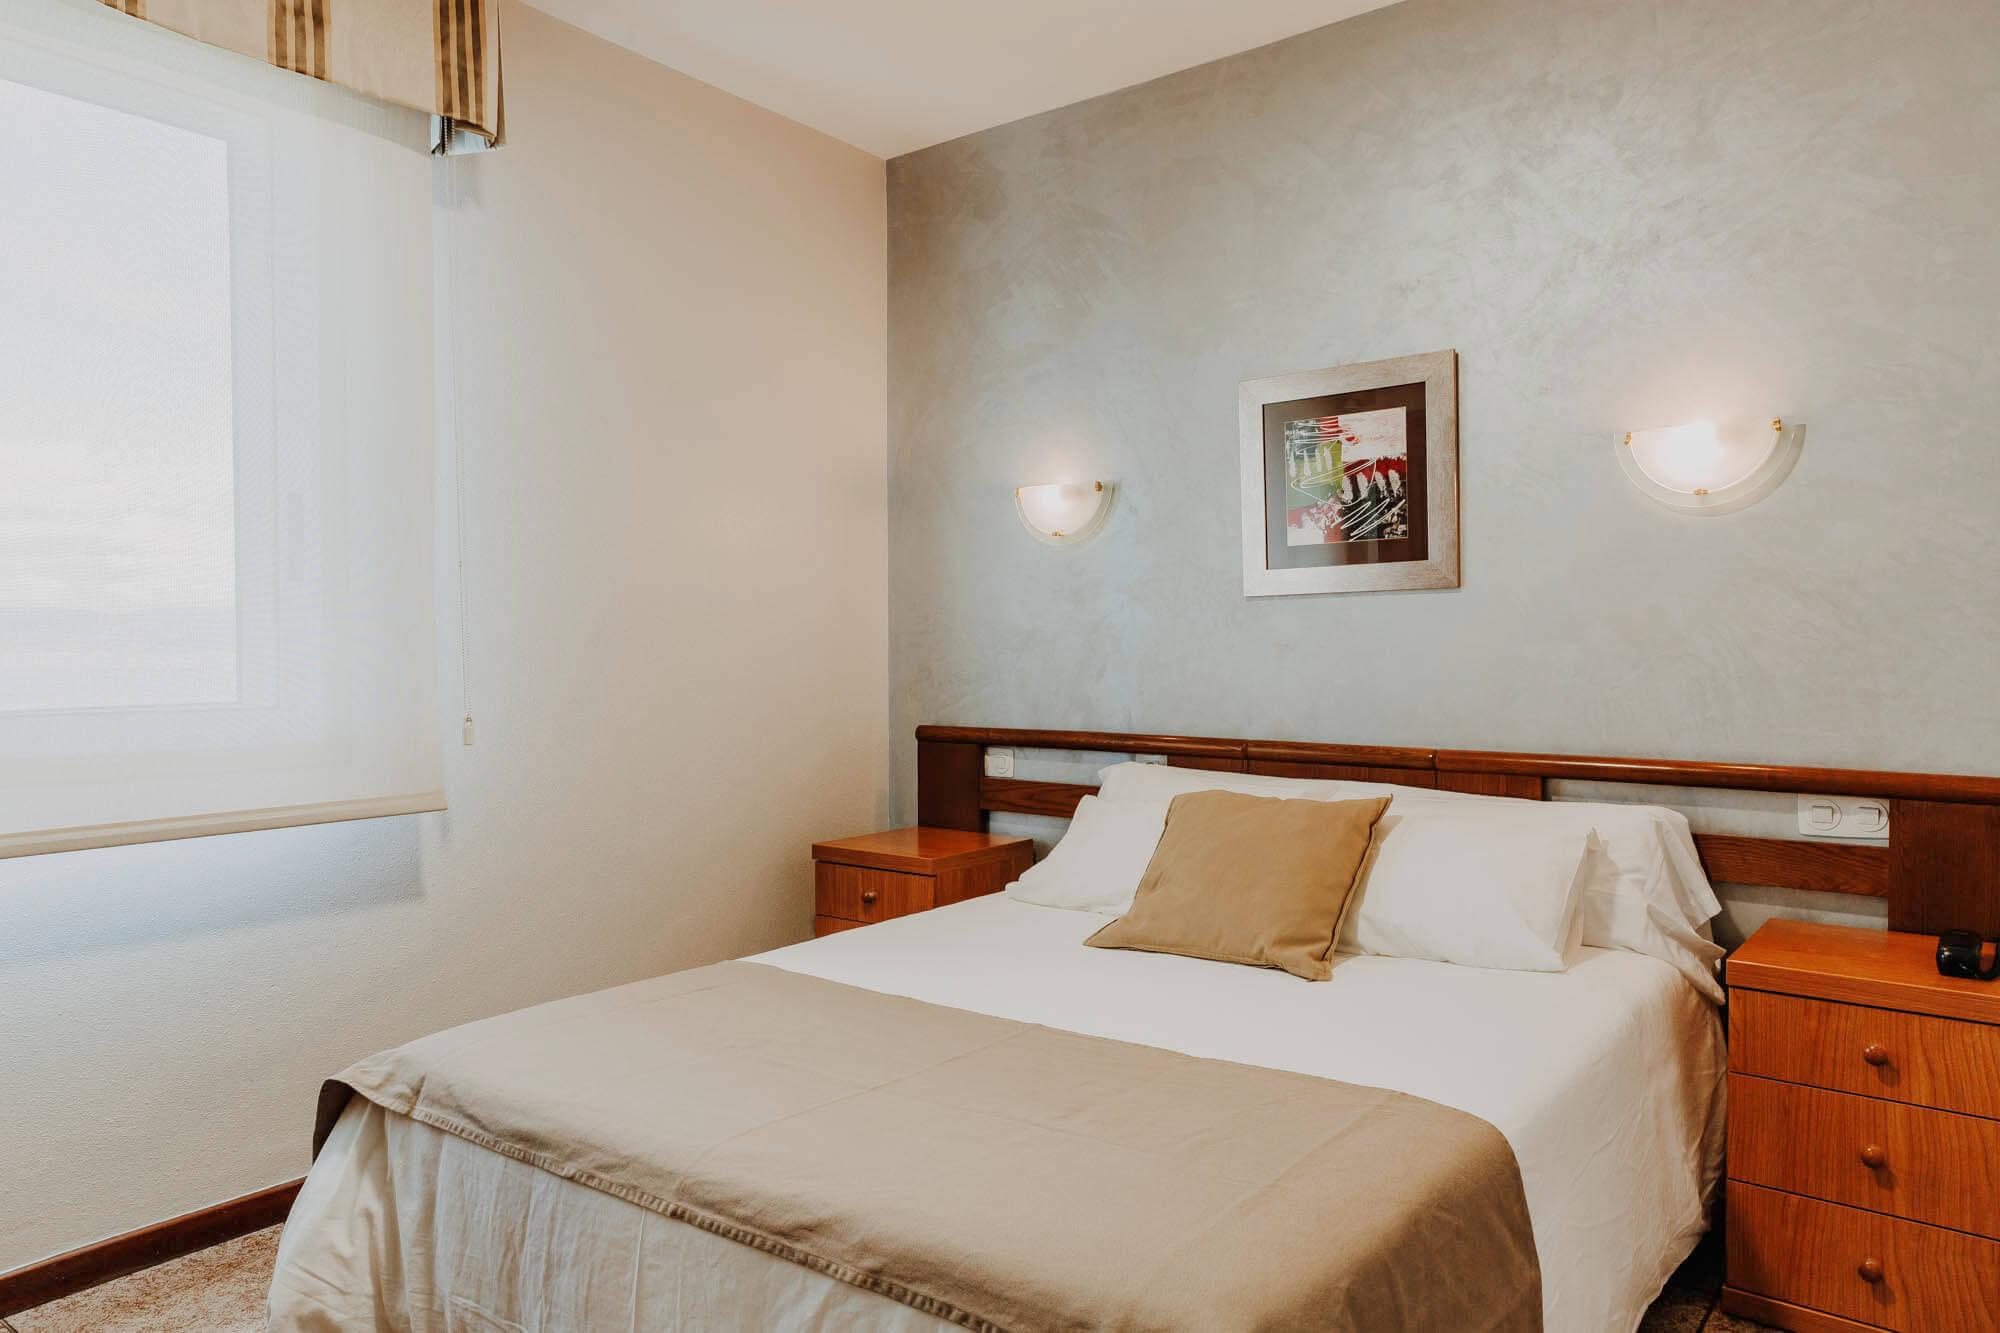 hotelincamardoble 3